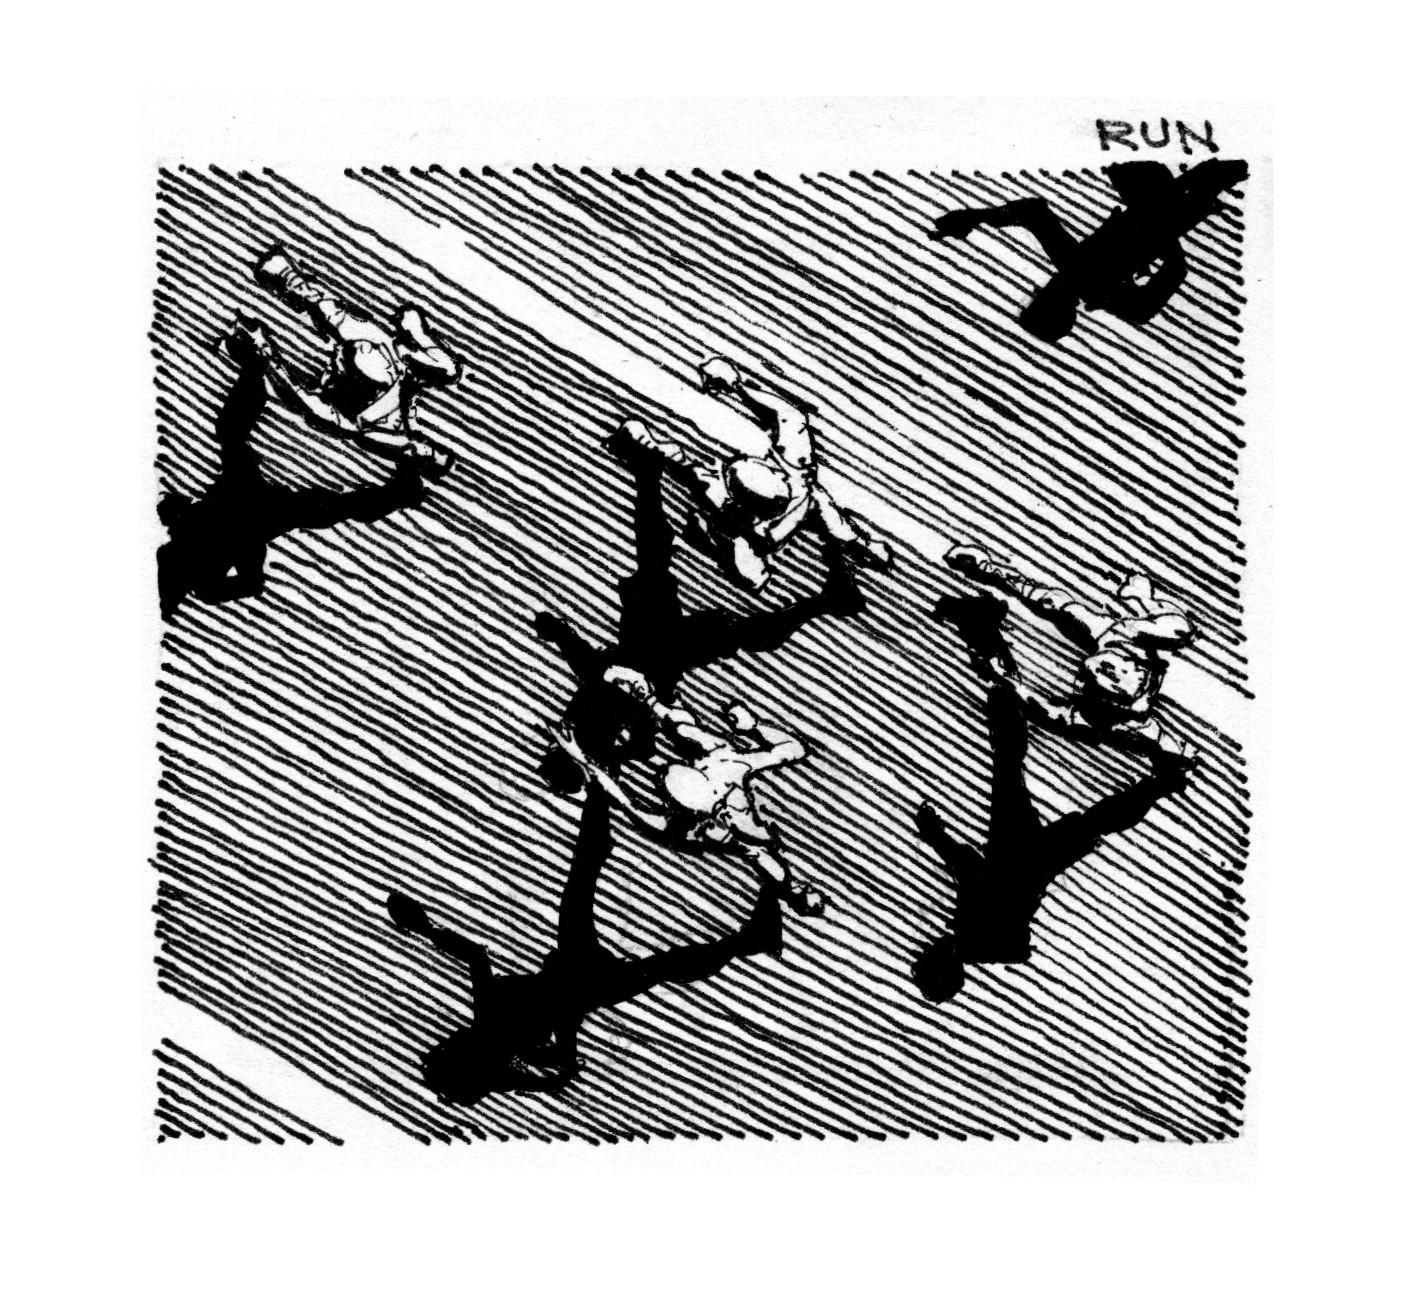 Midhat kapetanovic 11 run inktober2017